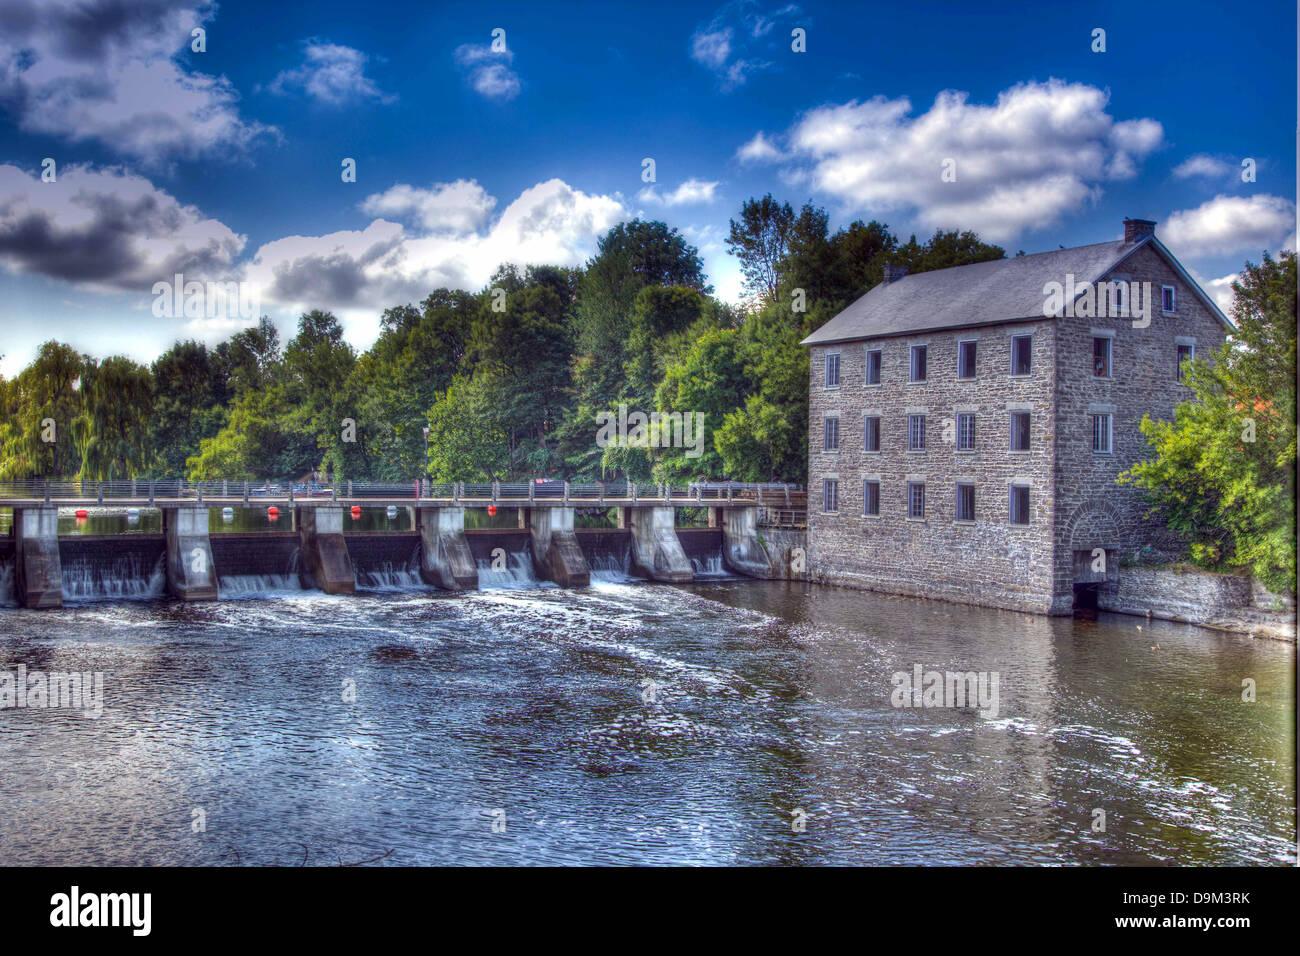 Watson's Grist Mill in Ottawa, Canada - Stock Image